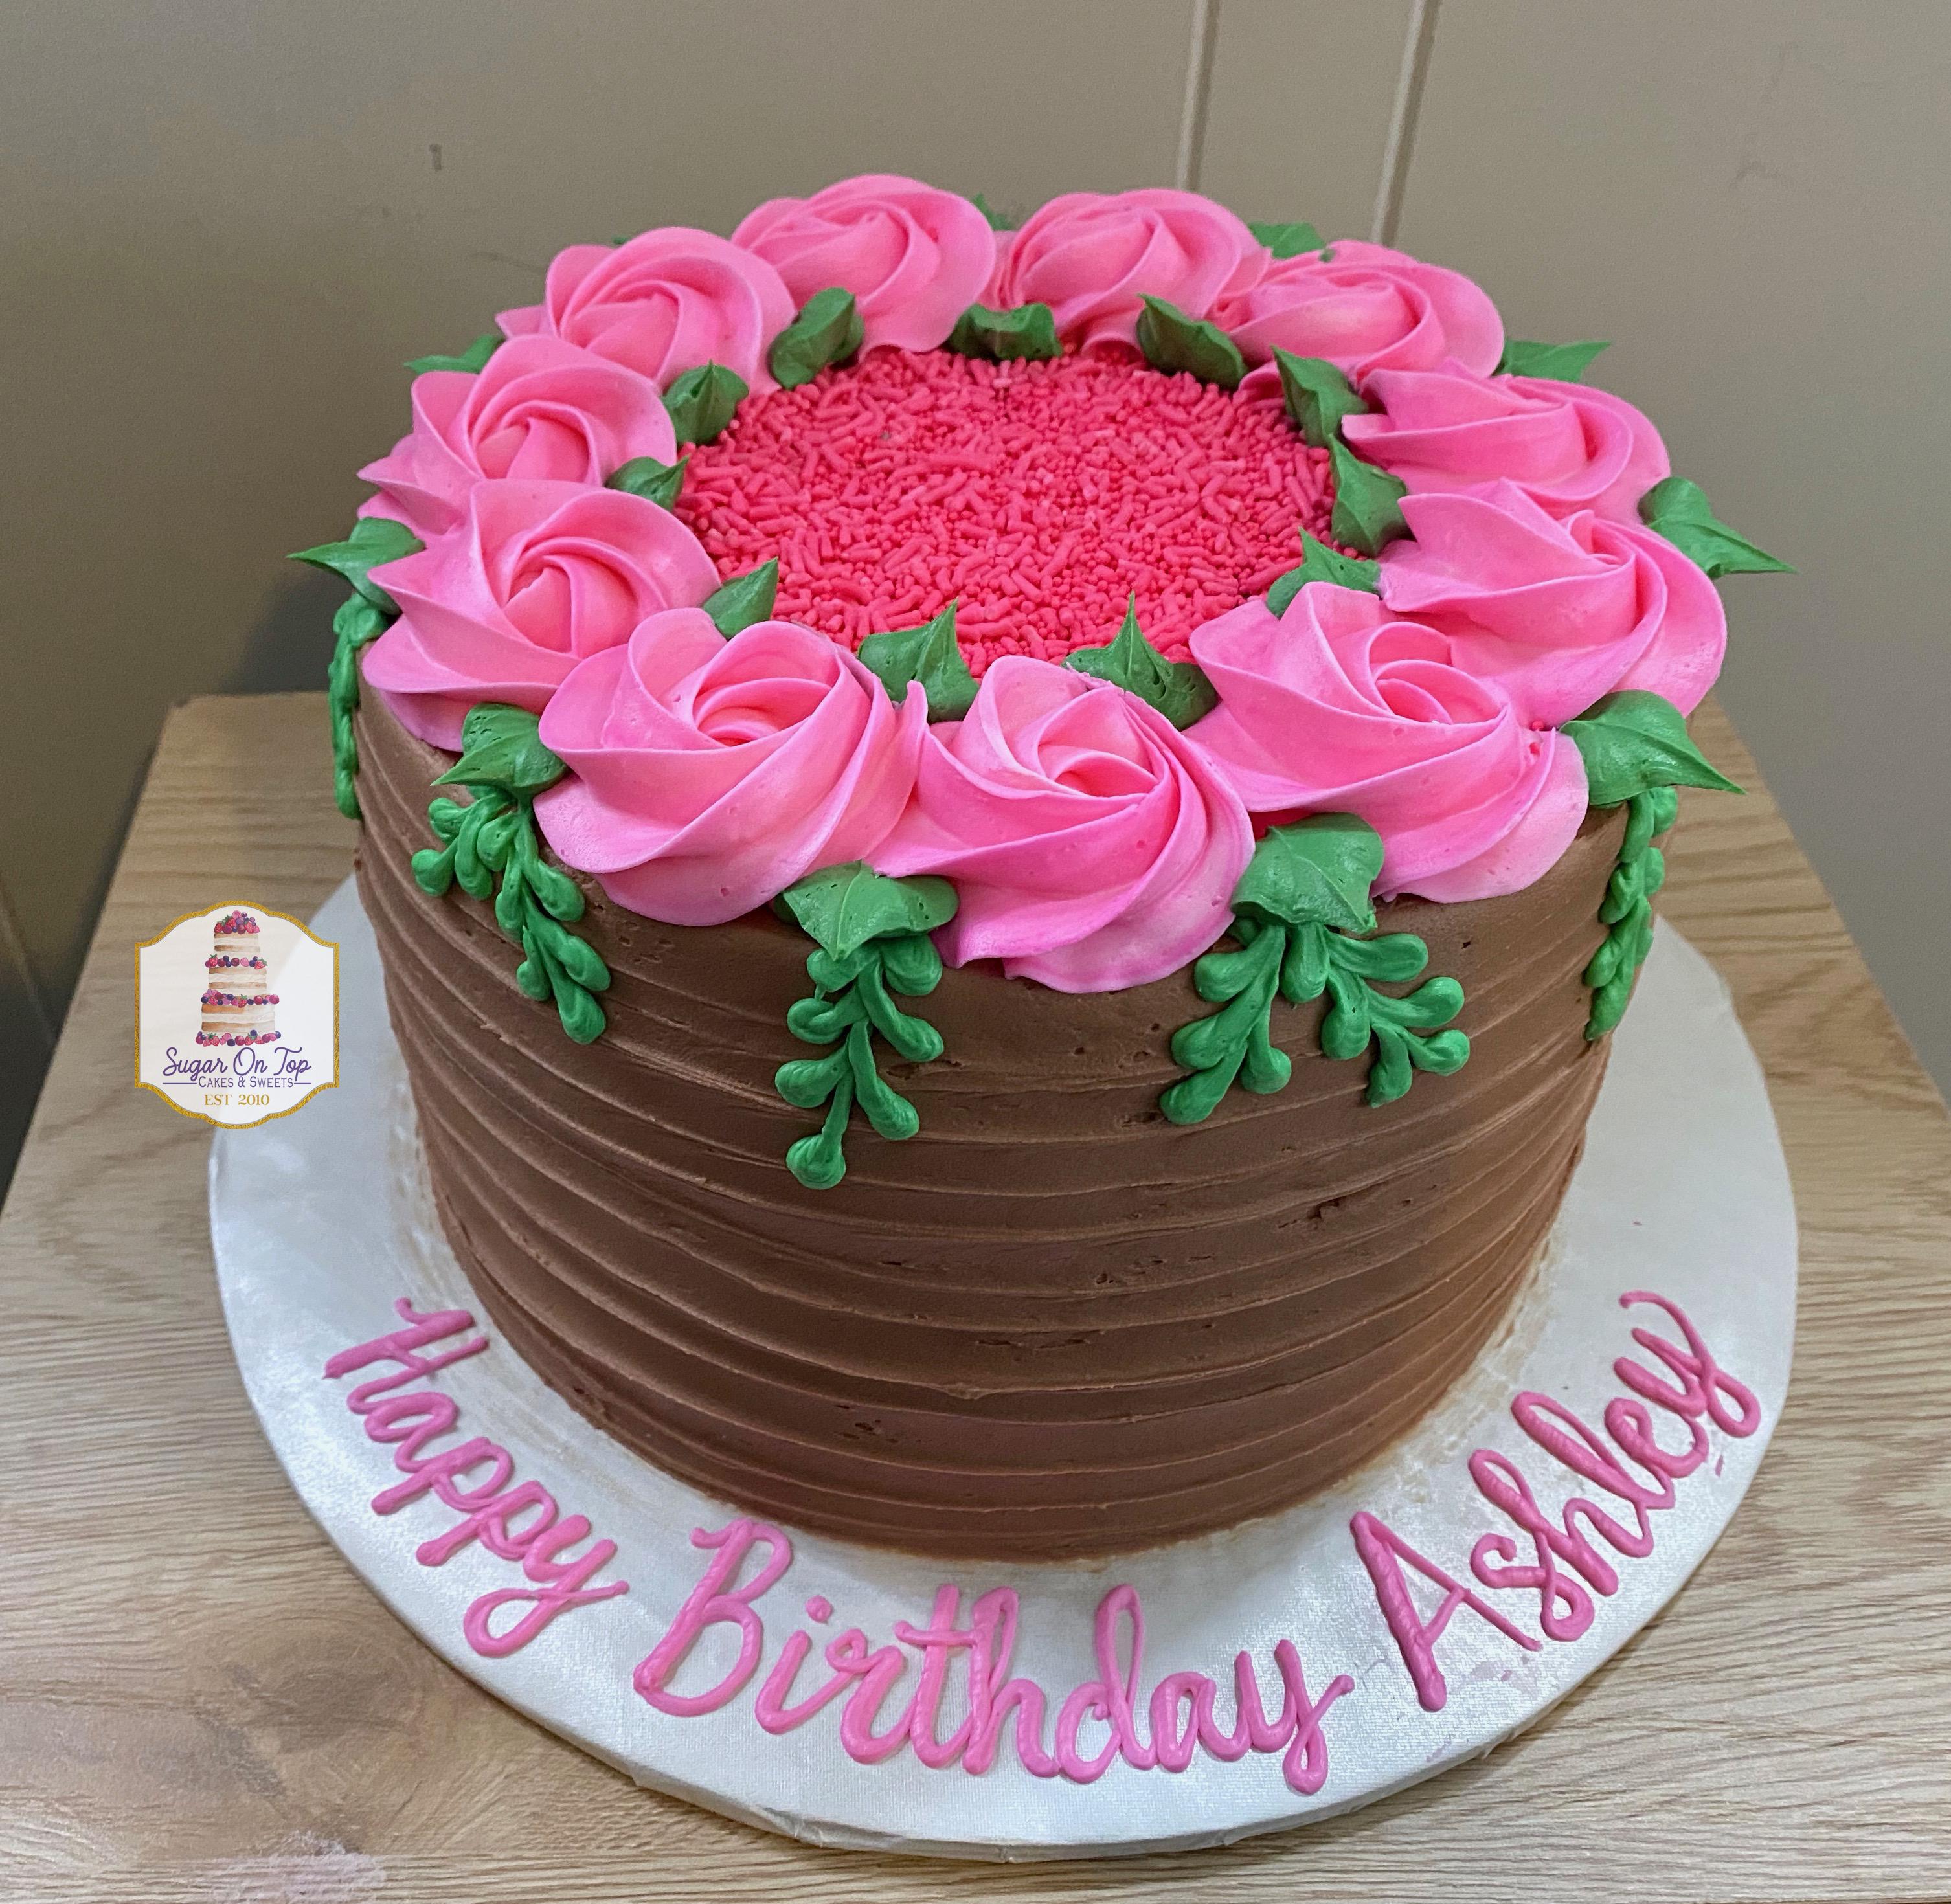 tammy dyer cake